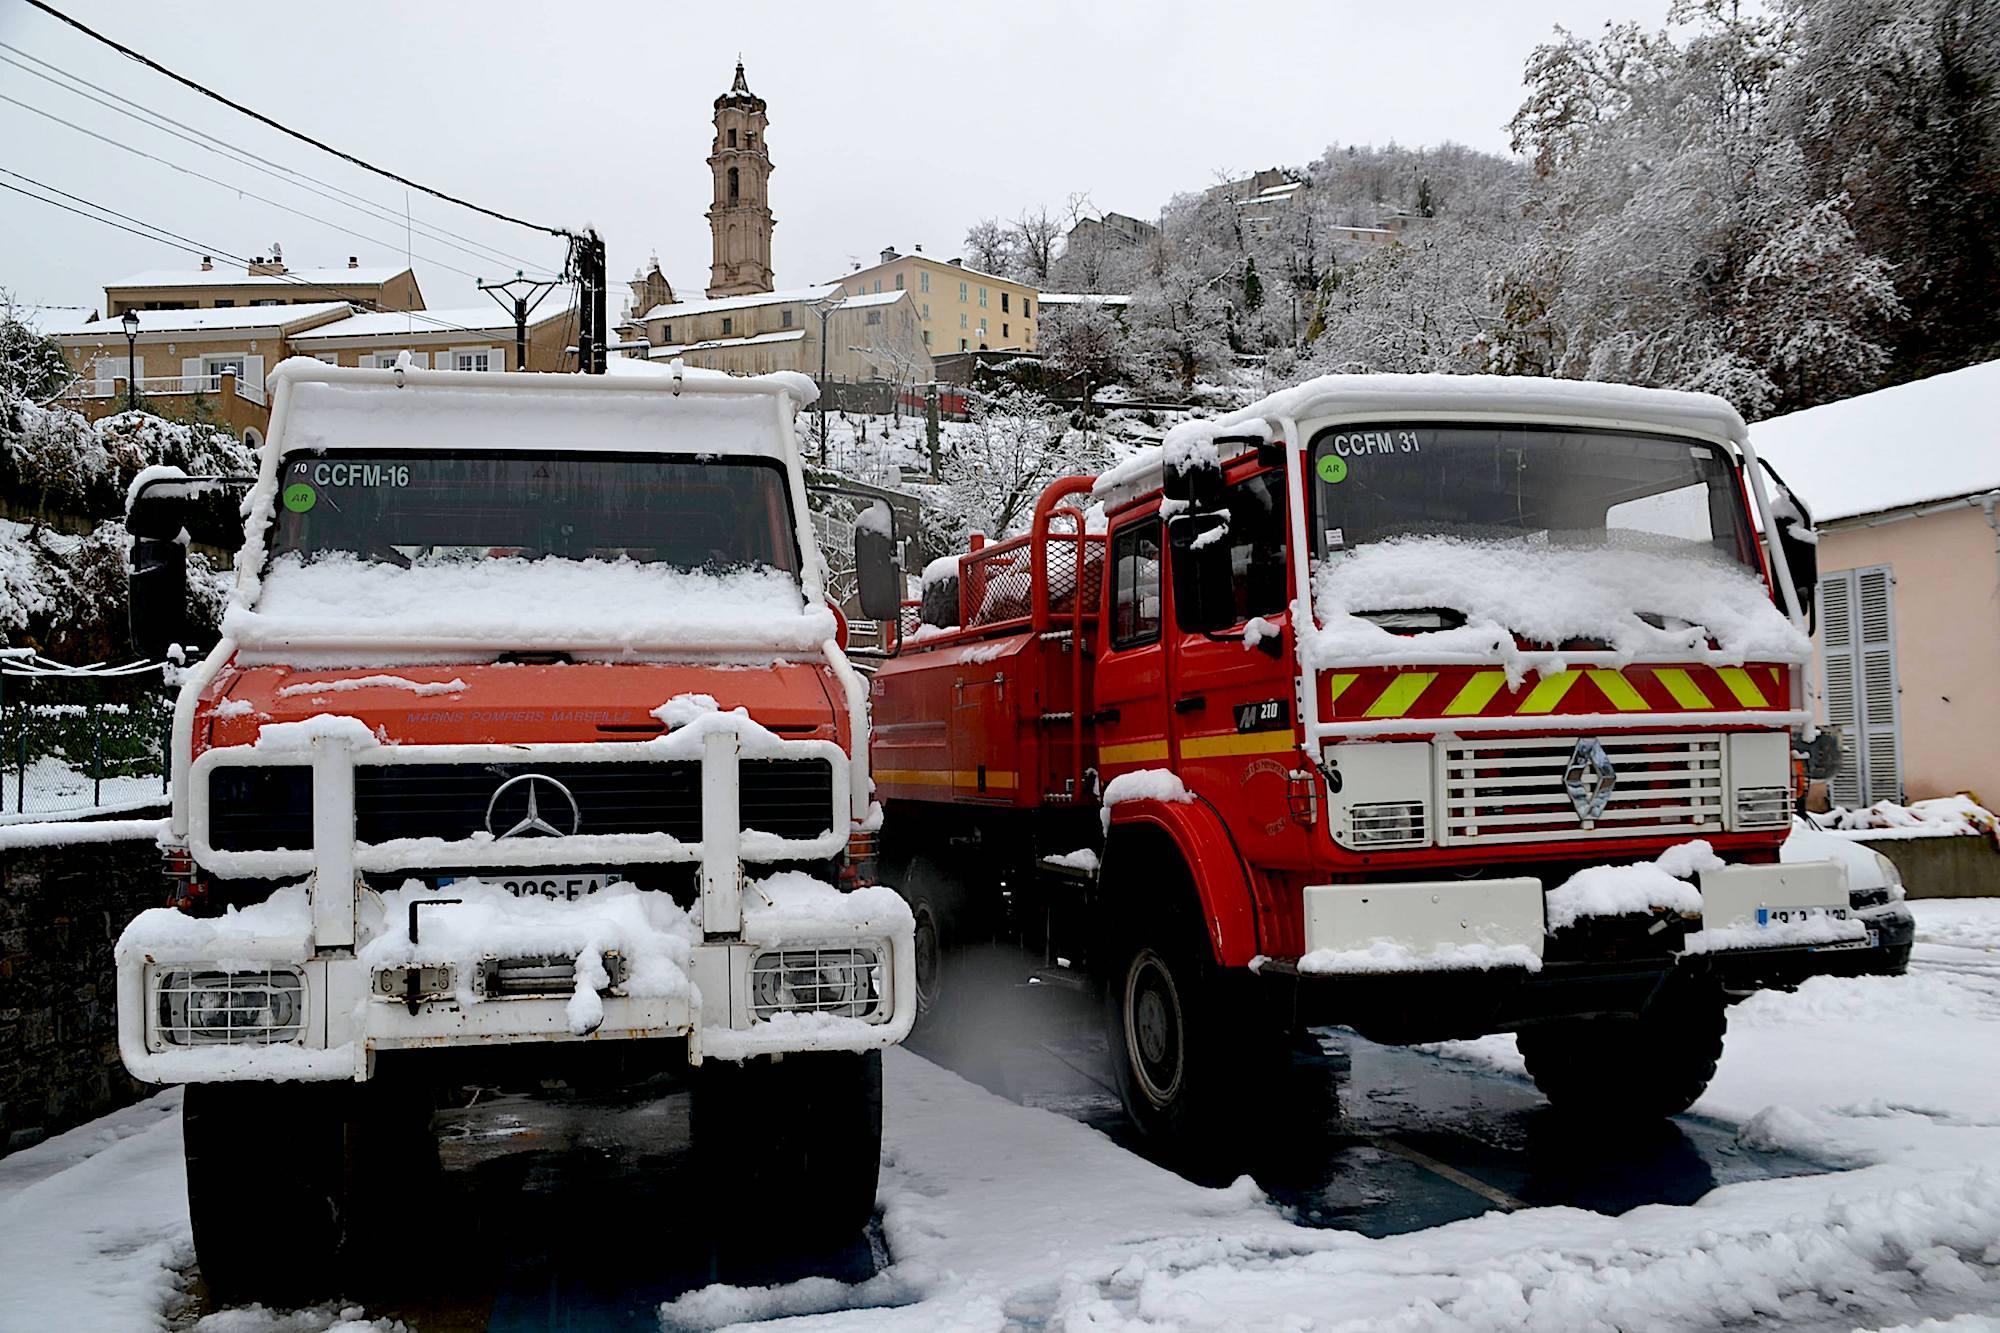 La Porta sous la neige (Photos Michèle Maestracci)